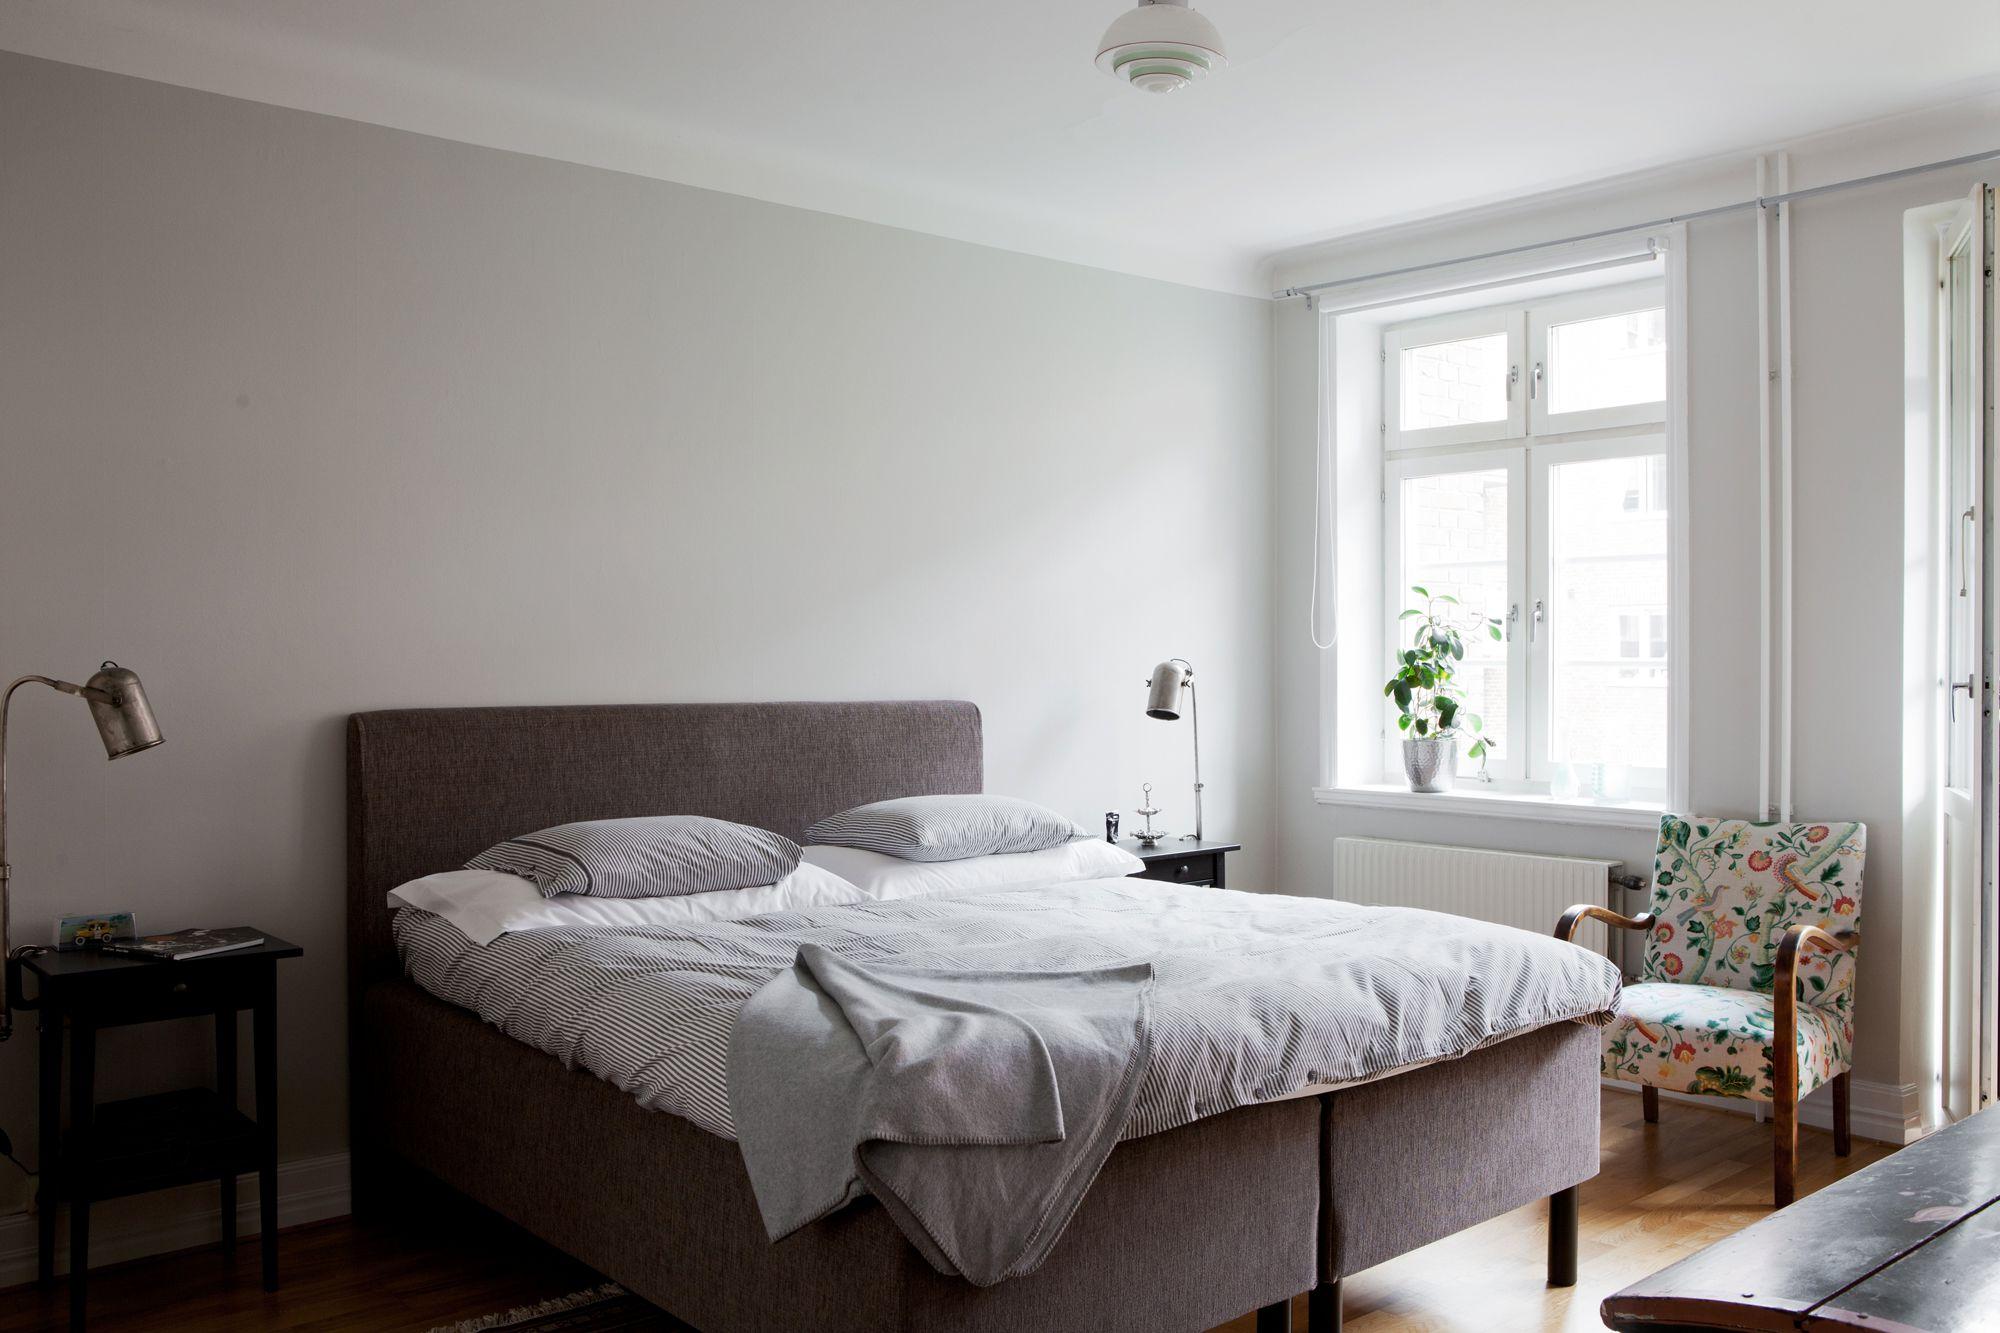 Paredes grises muebles blancos suelo de madera blog for Muebles oscuros paredes claras